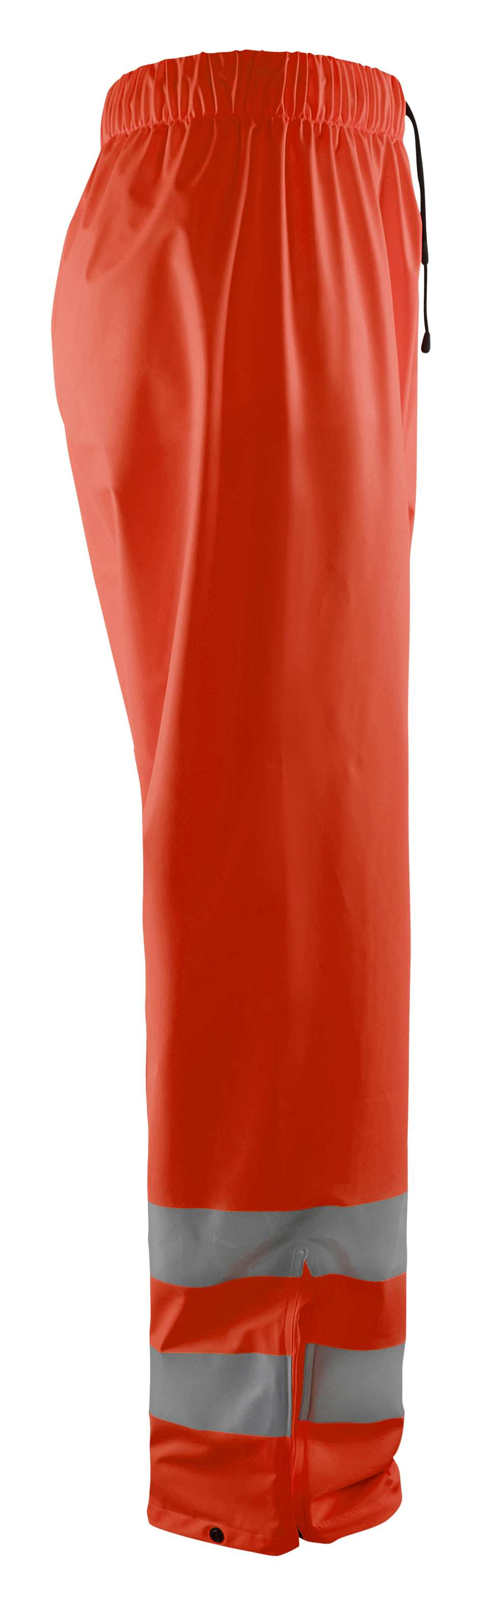 Blaklader Regenbroeken 13842000 High Vis fluor rood(5500)